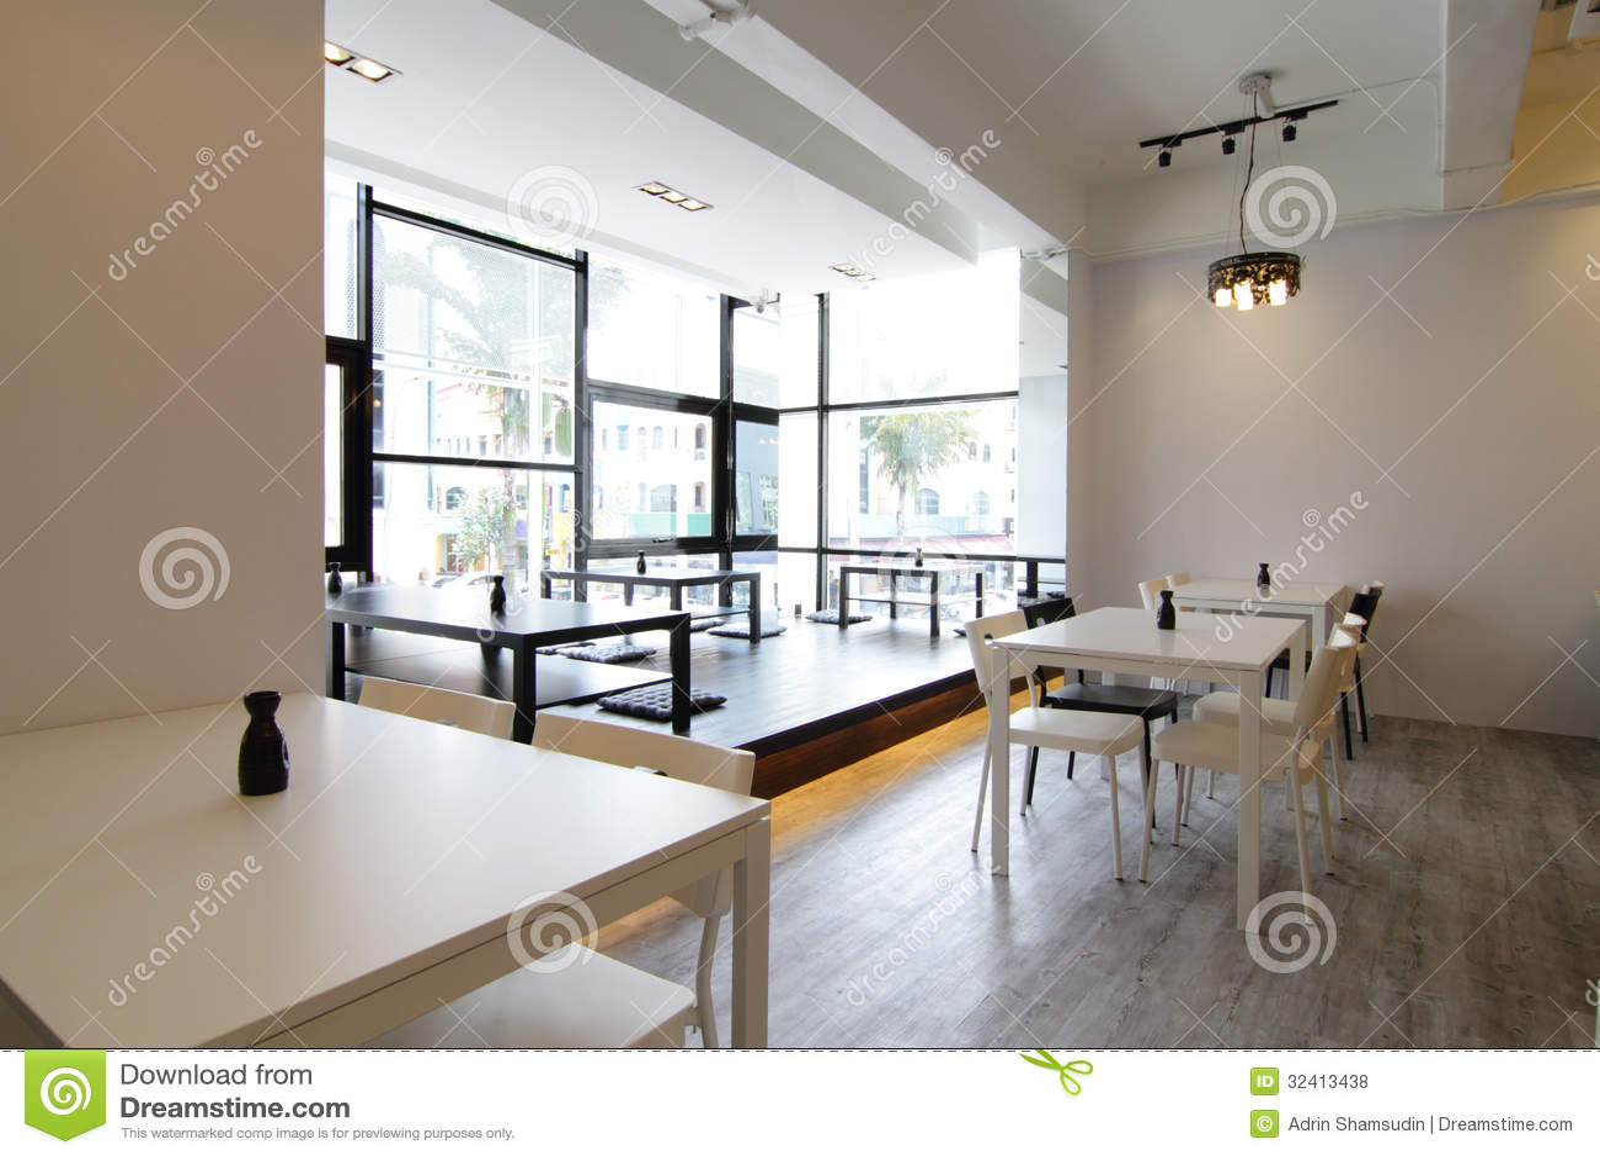 Best Decoration Restaurant Moderne Pictures - ansomone.us ...